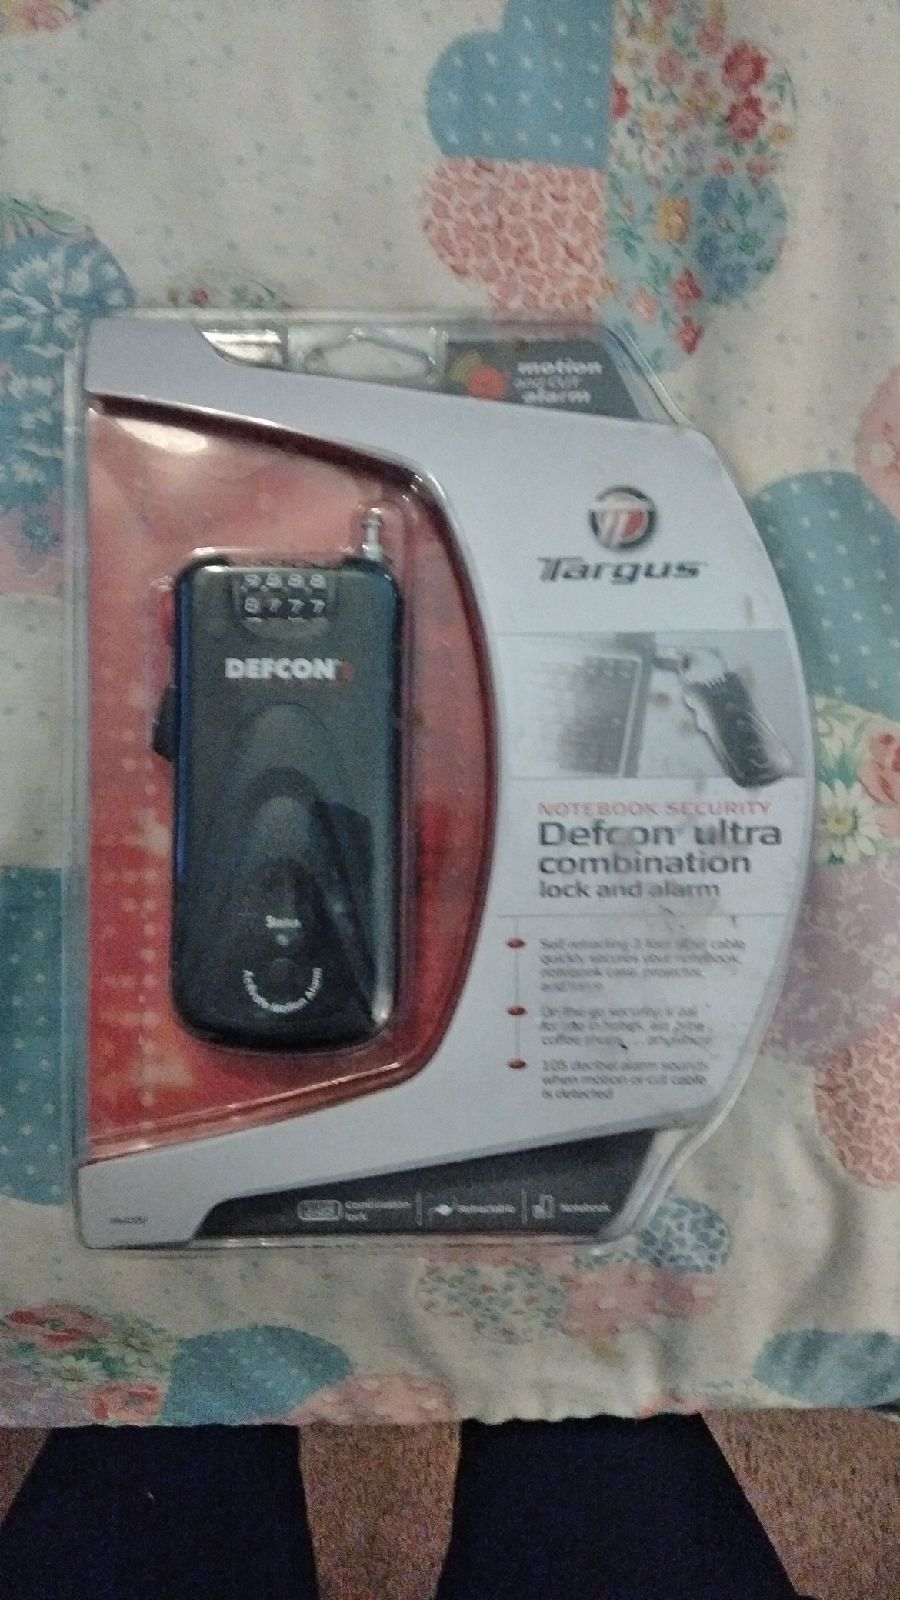 Targus Defcon Ultra combination lock